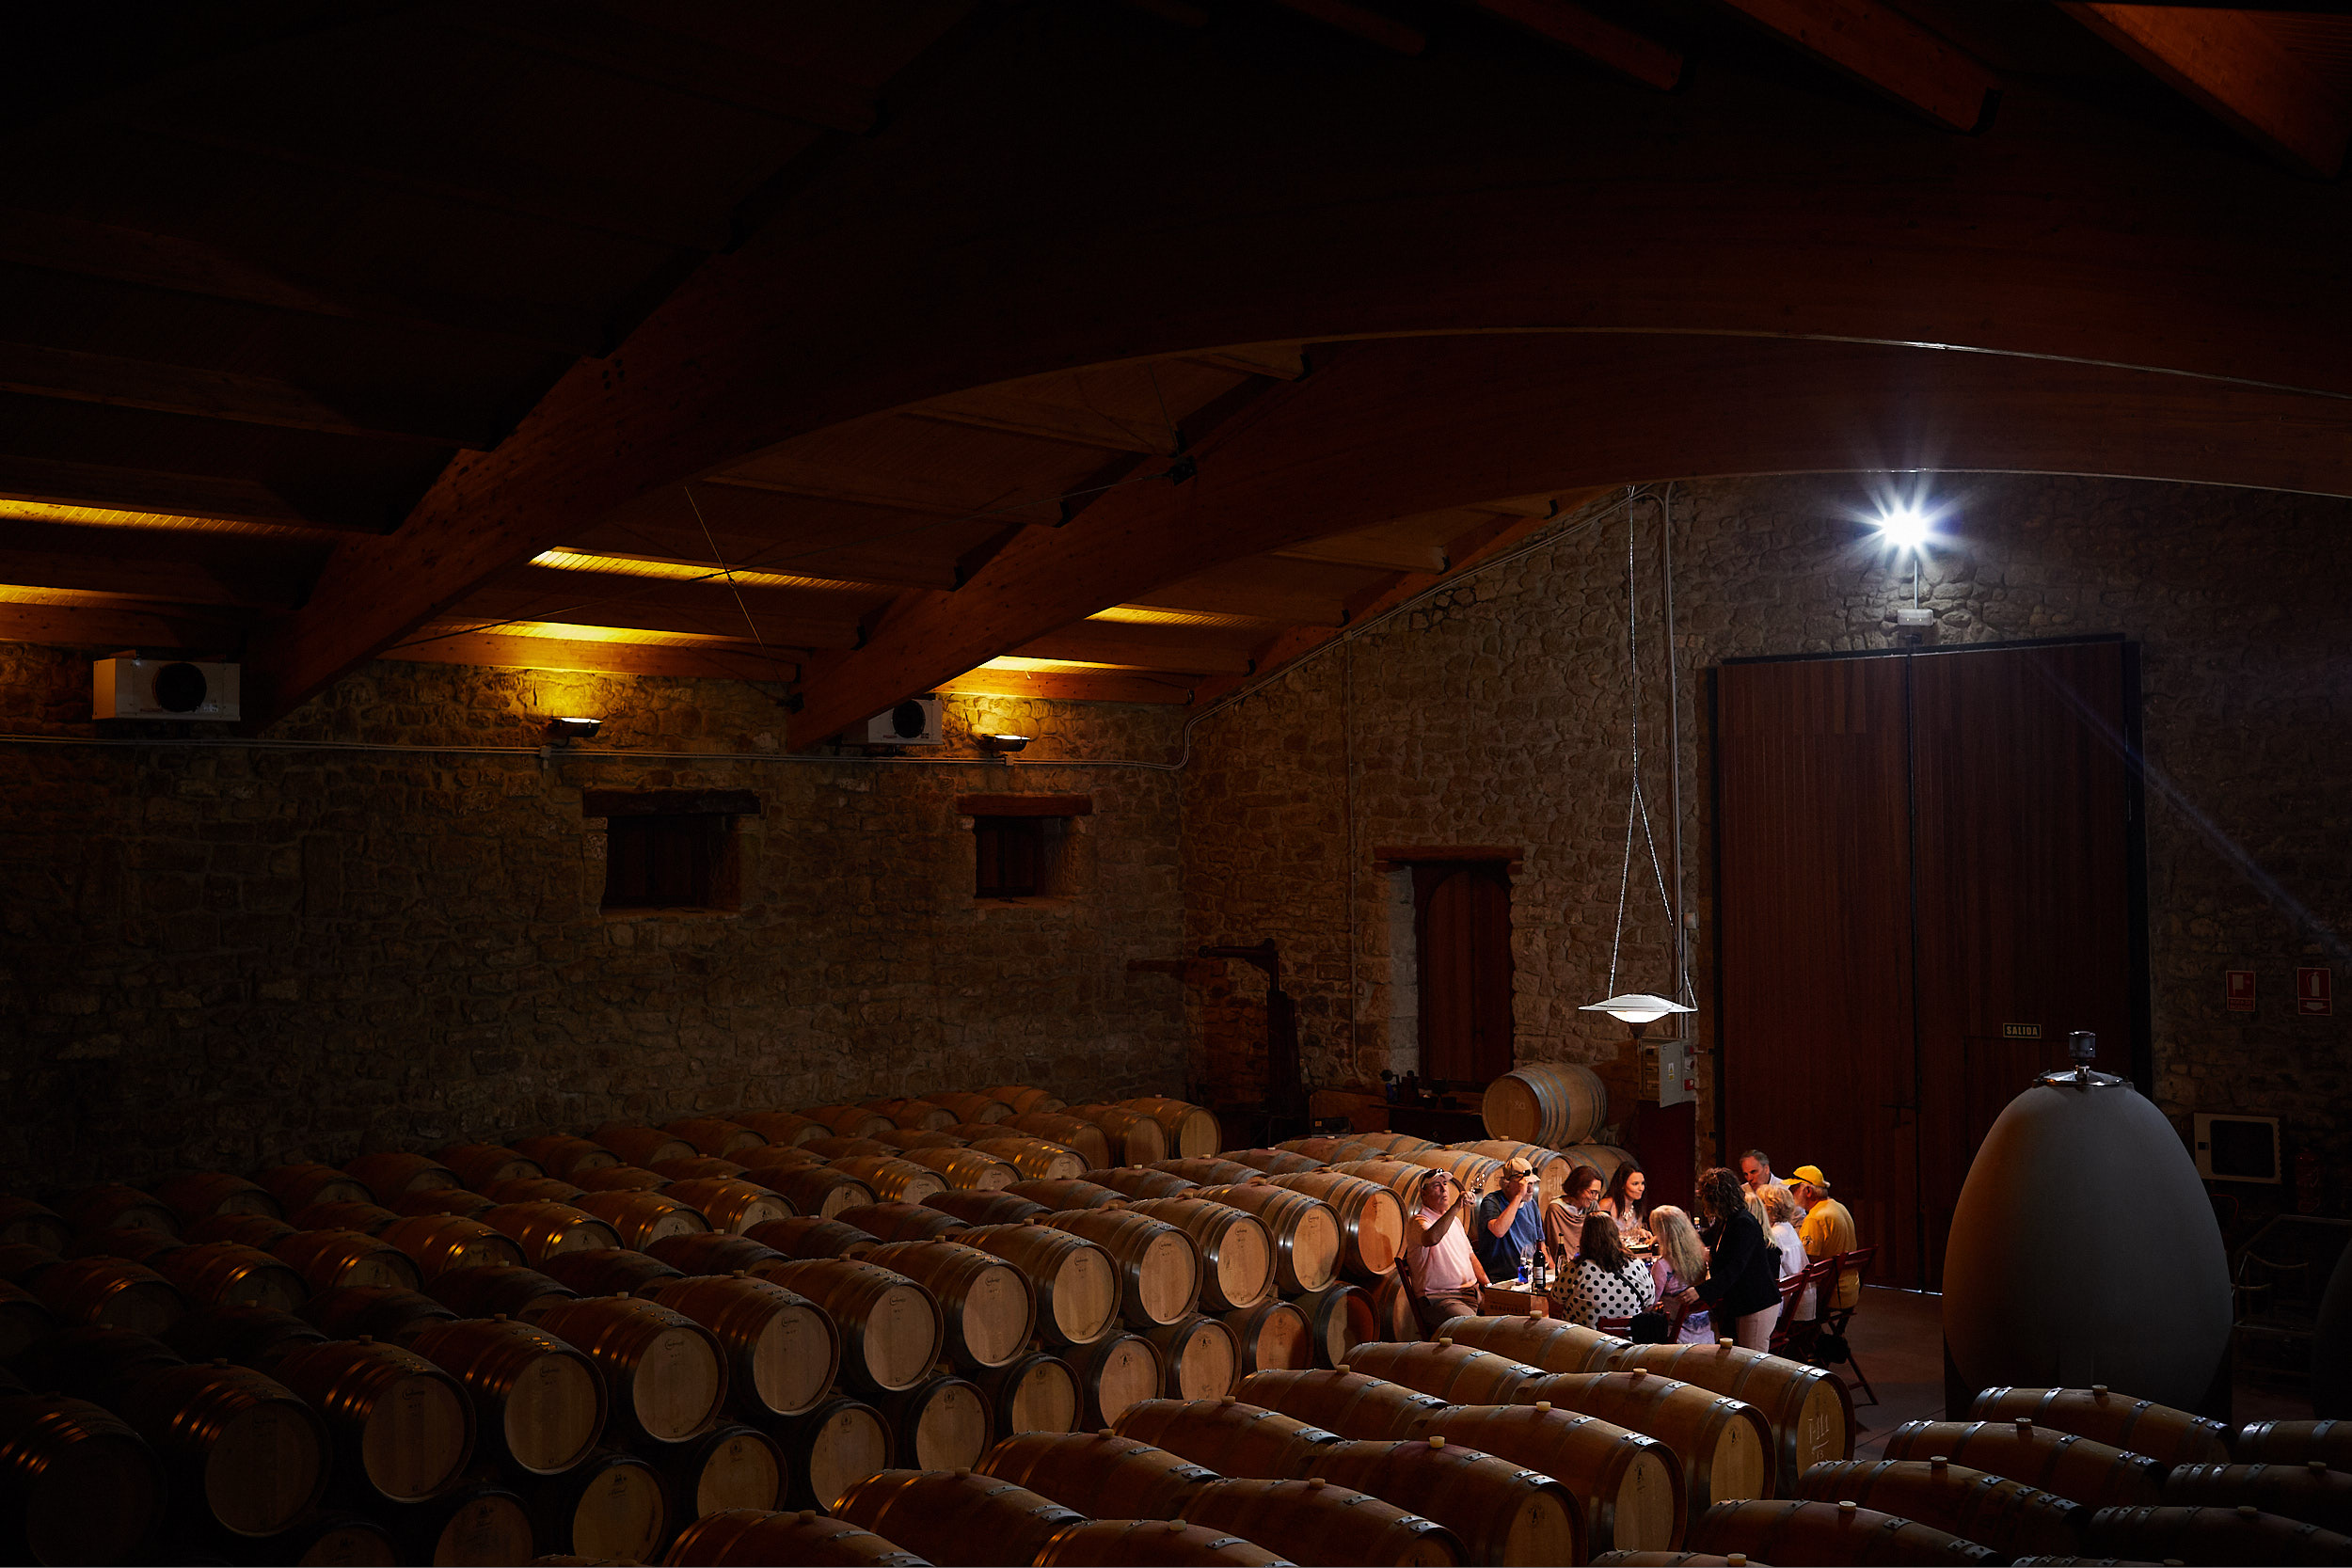 19/9/2018. English-speaking photographer Rioja Spain. Enoturismo. Bodegas Gómez Cruzado, Haro, La Rioja, Spain. Photo by James Sturcke | sturcke.org